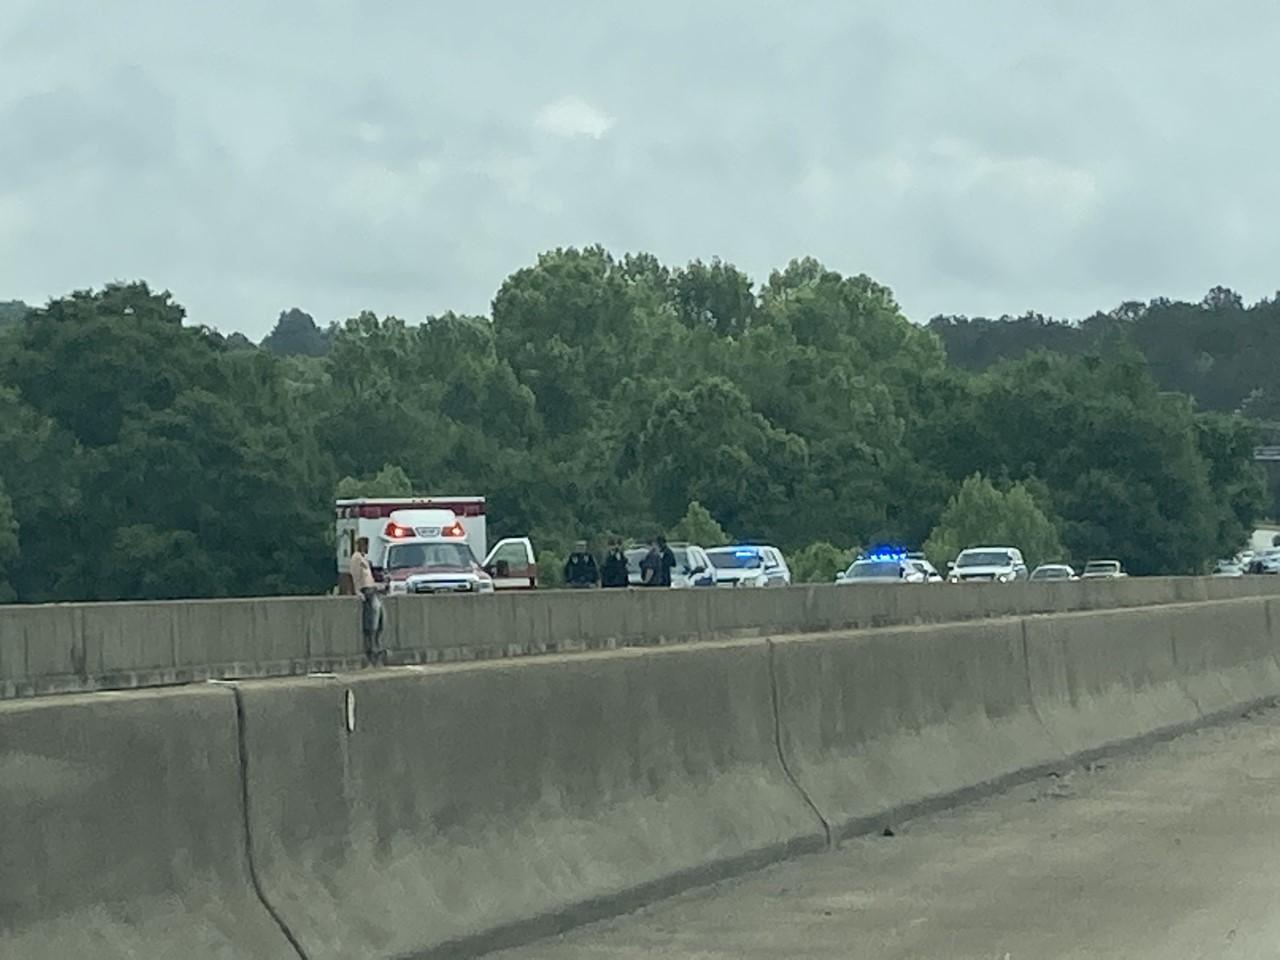 Police on scene at JR Allen bridge heading into Phenix City